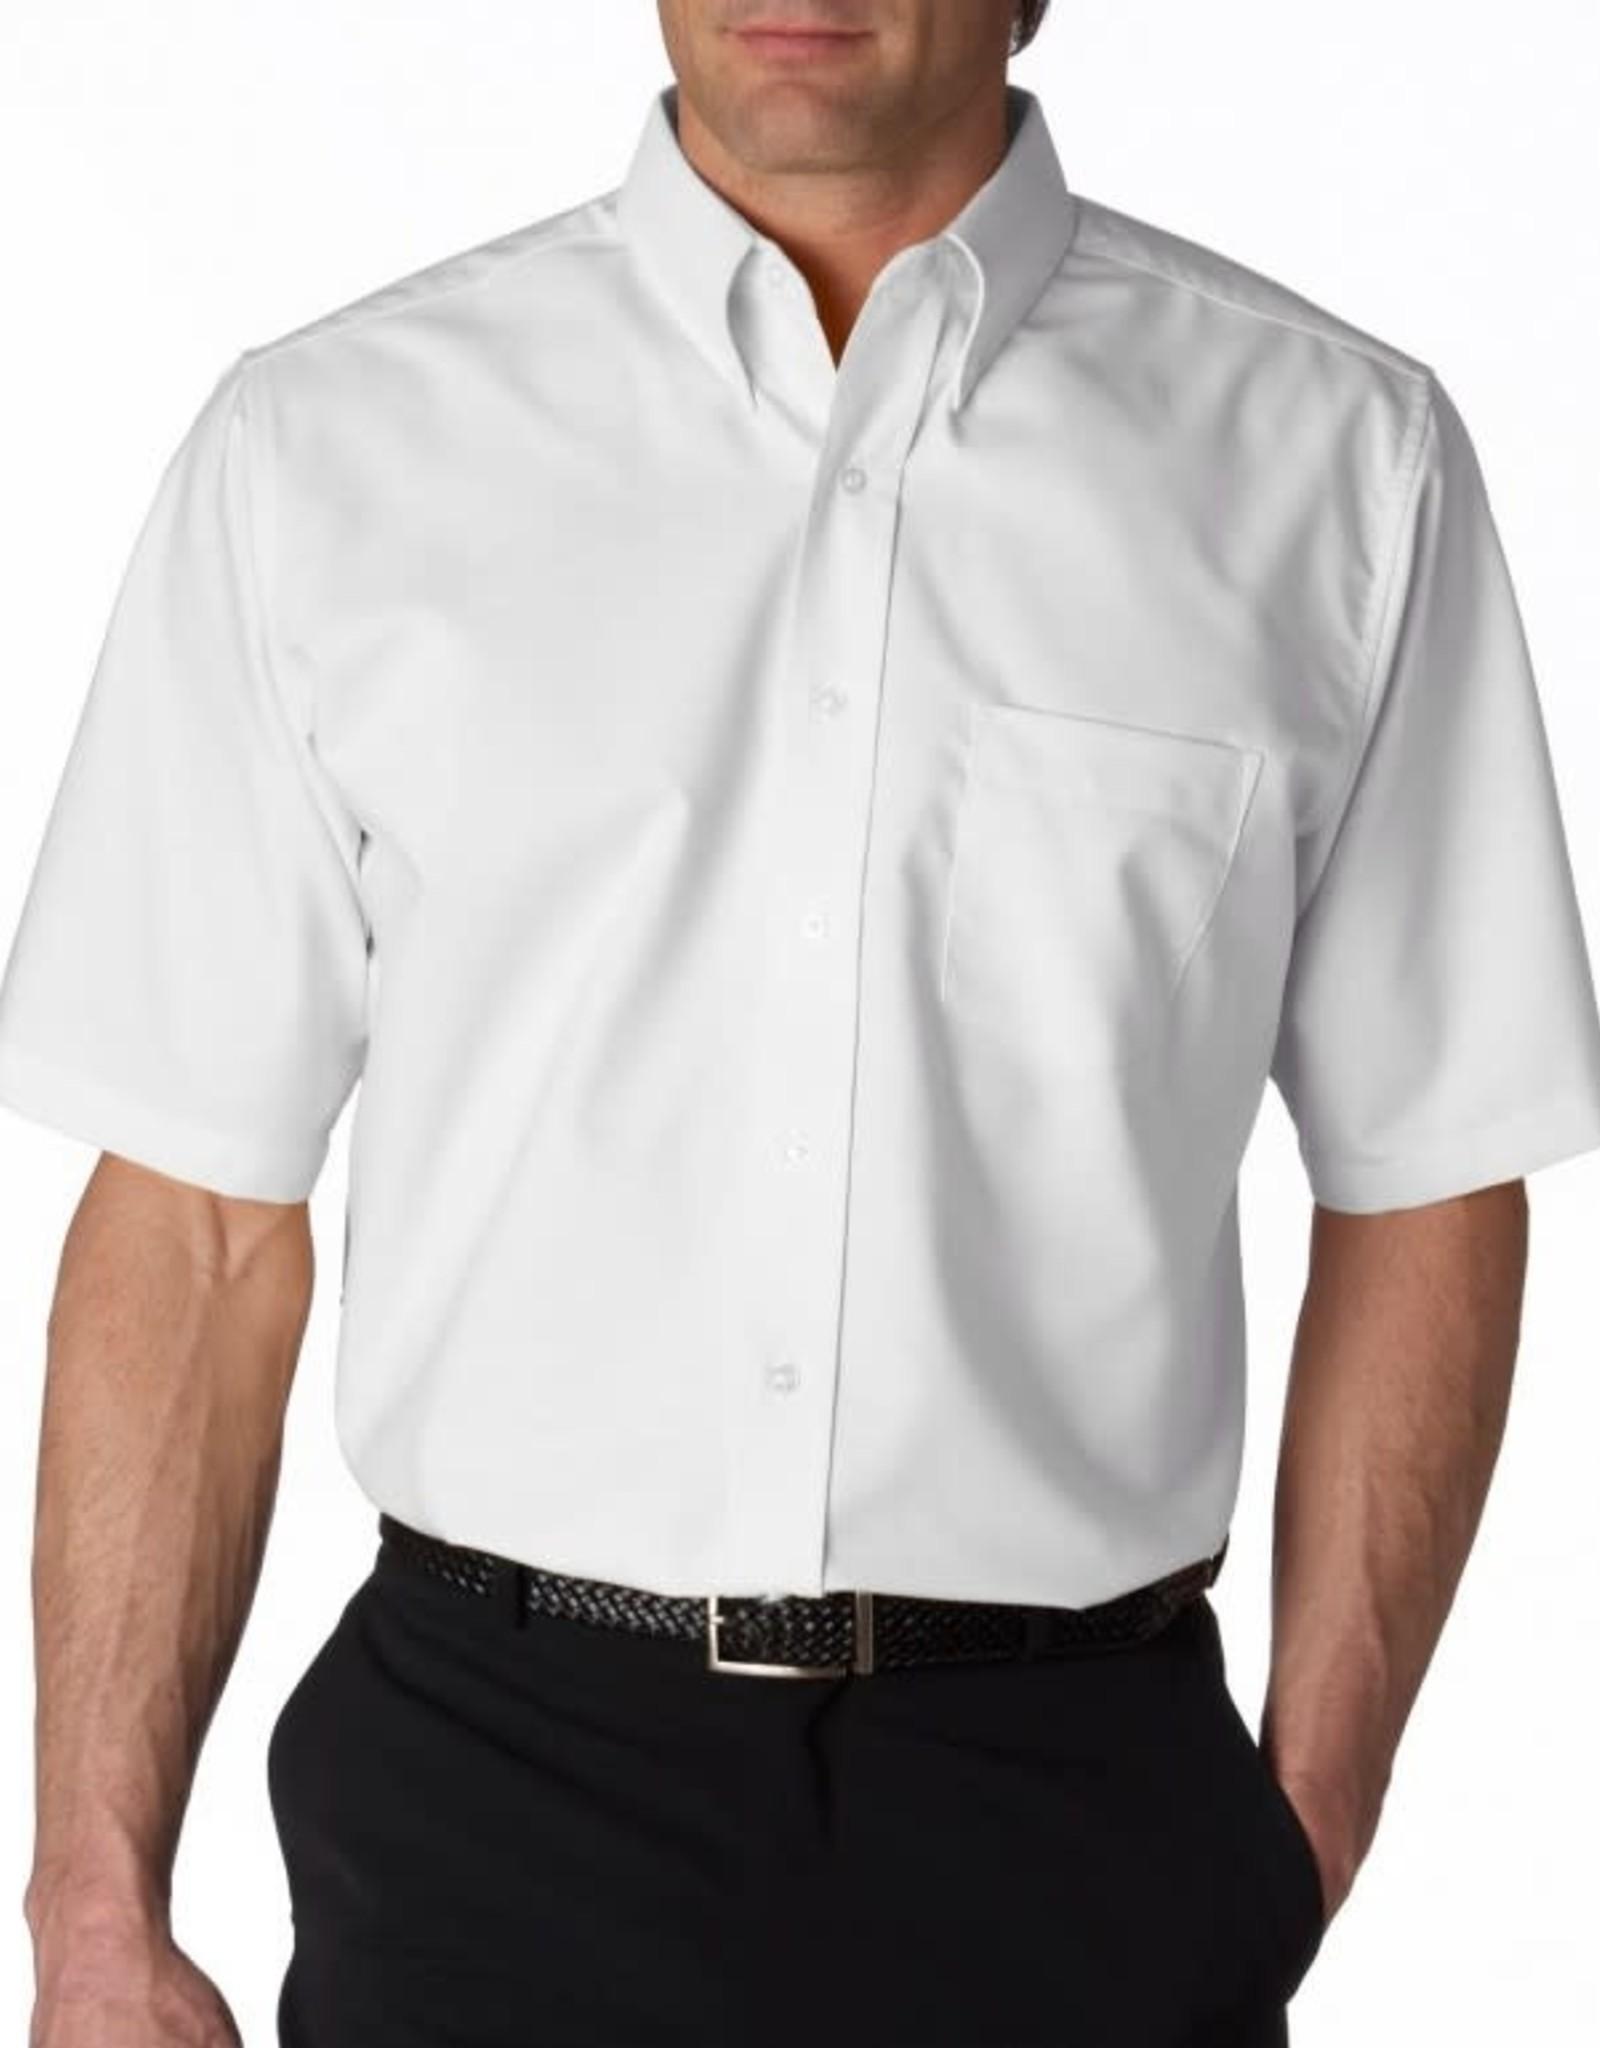 White Short Sleeve Dress Shirt